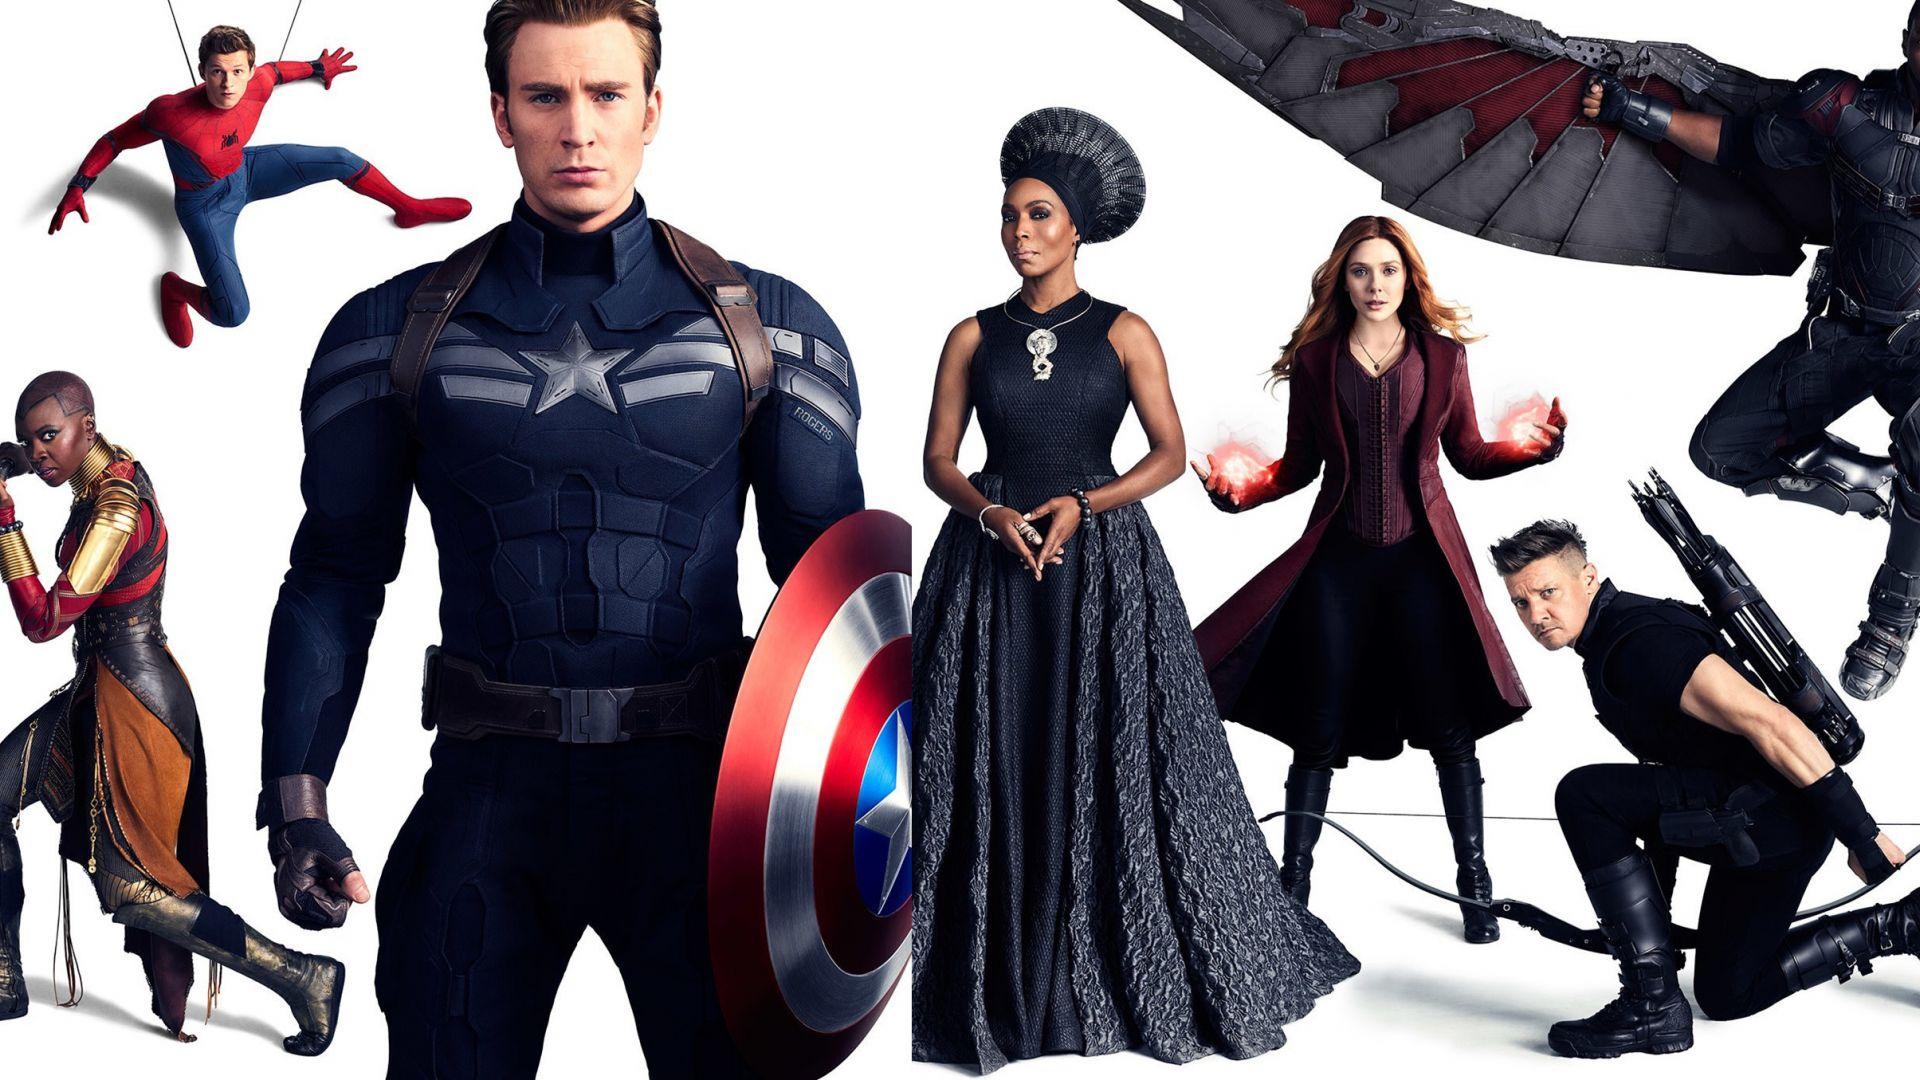 Wallpaper Avengers: Infinity War, captain america, nick fury, hawkeye, doctor strange, falcon, wanda, maximoff, spider man, 4k